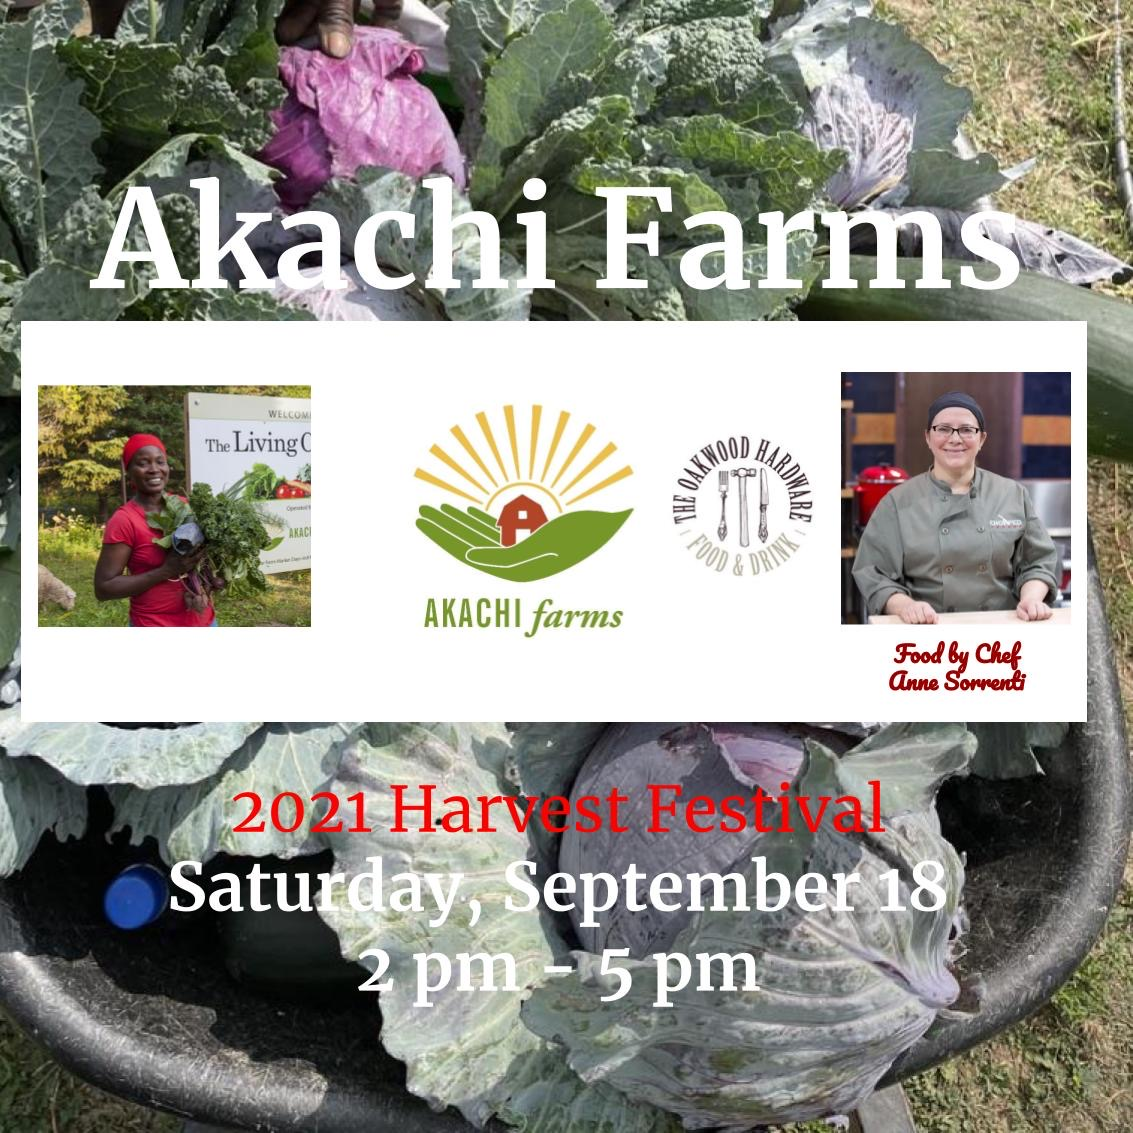 Akachi Farms event flyer